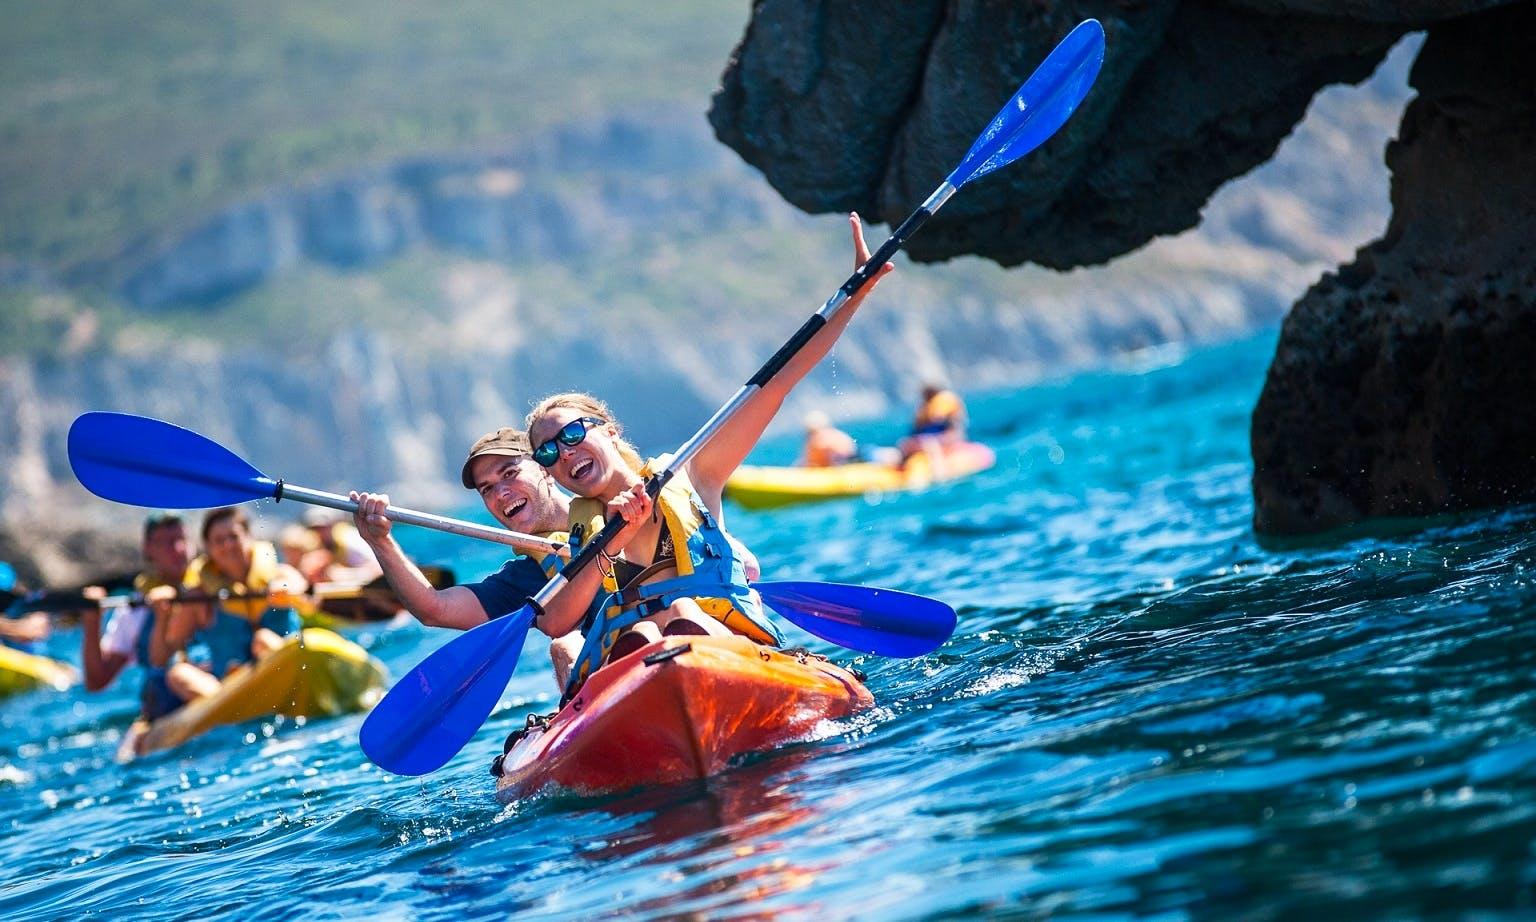 Reserve a Kayak in Sesimbra, Today!